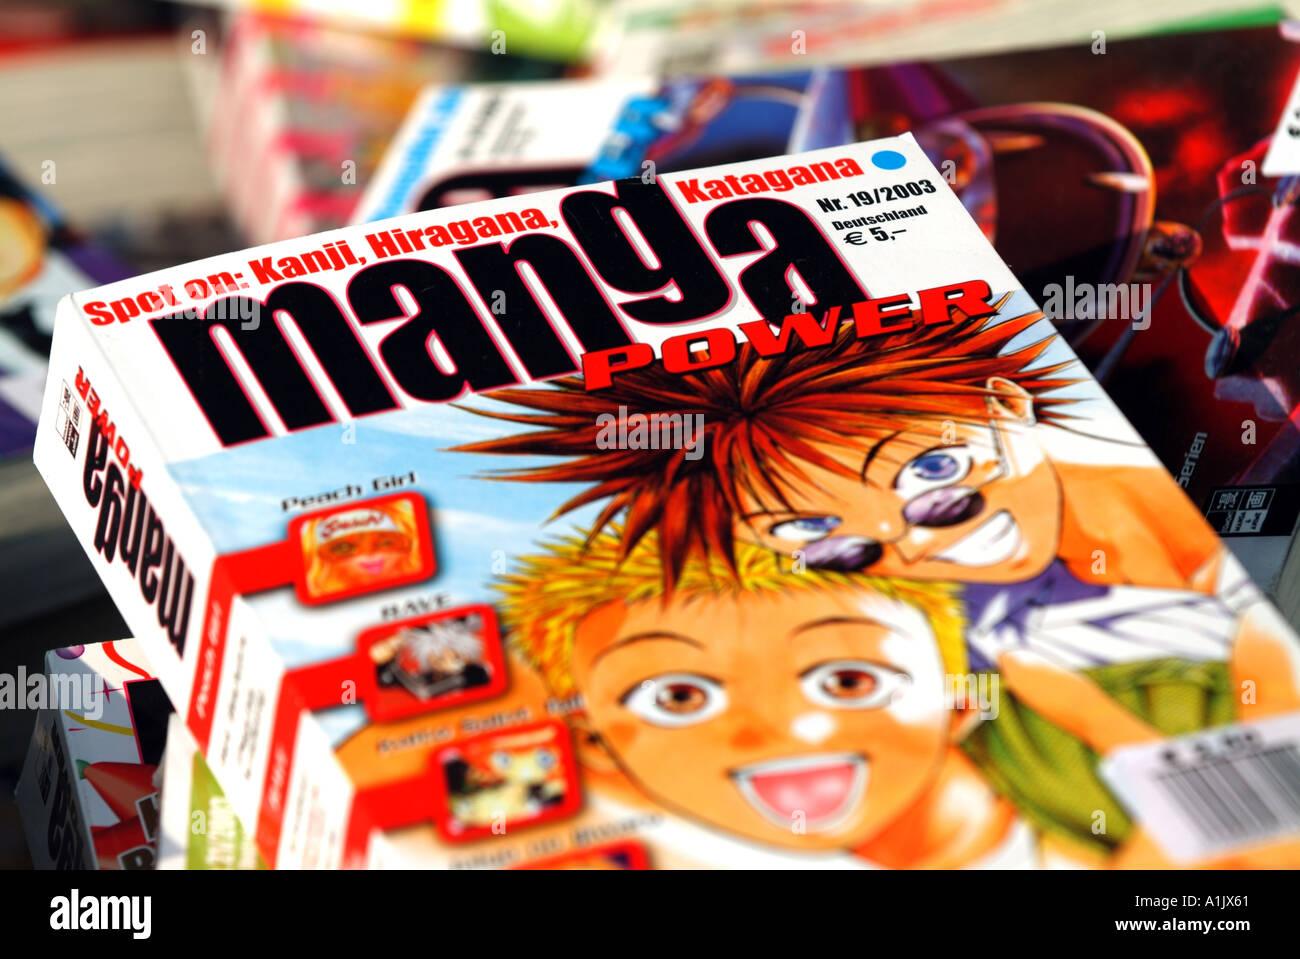 Manga books manga art anime manga nippon nipponese hong kong jap japan japanese asia asian manga art illustration graphic design